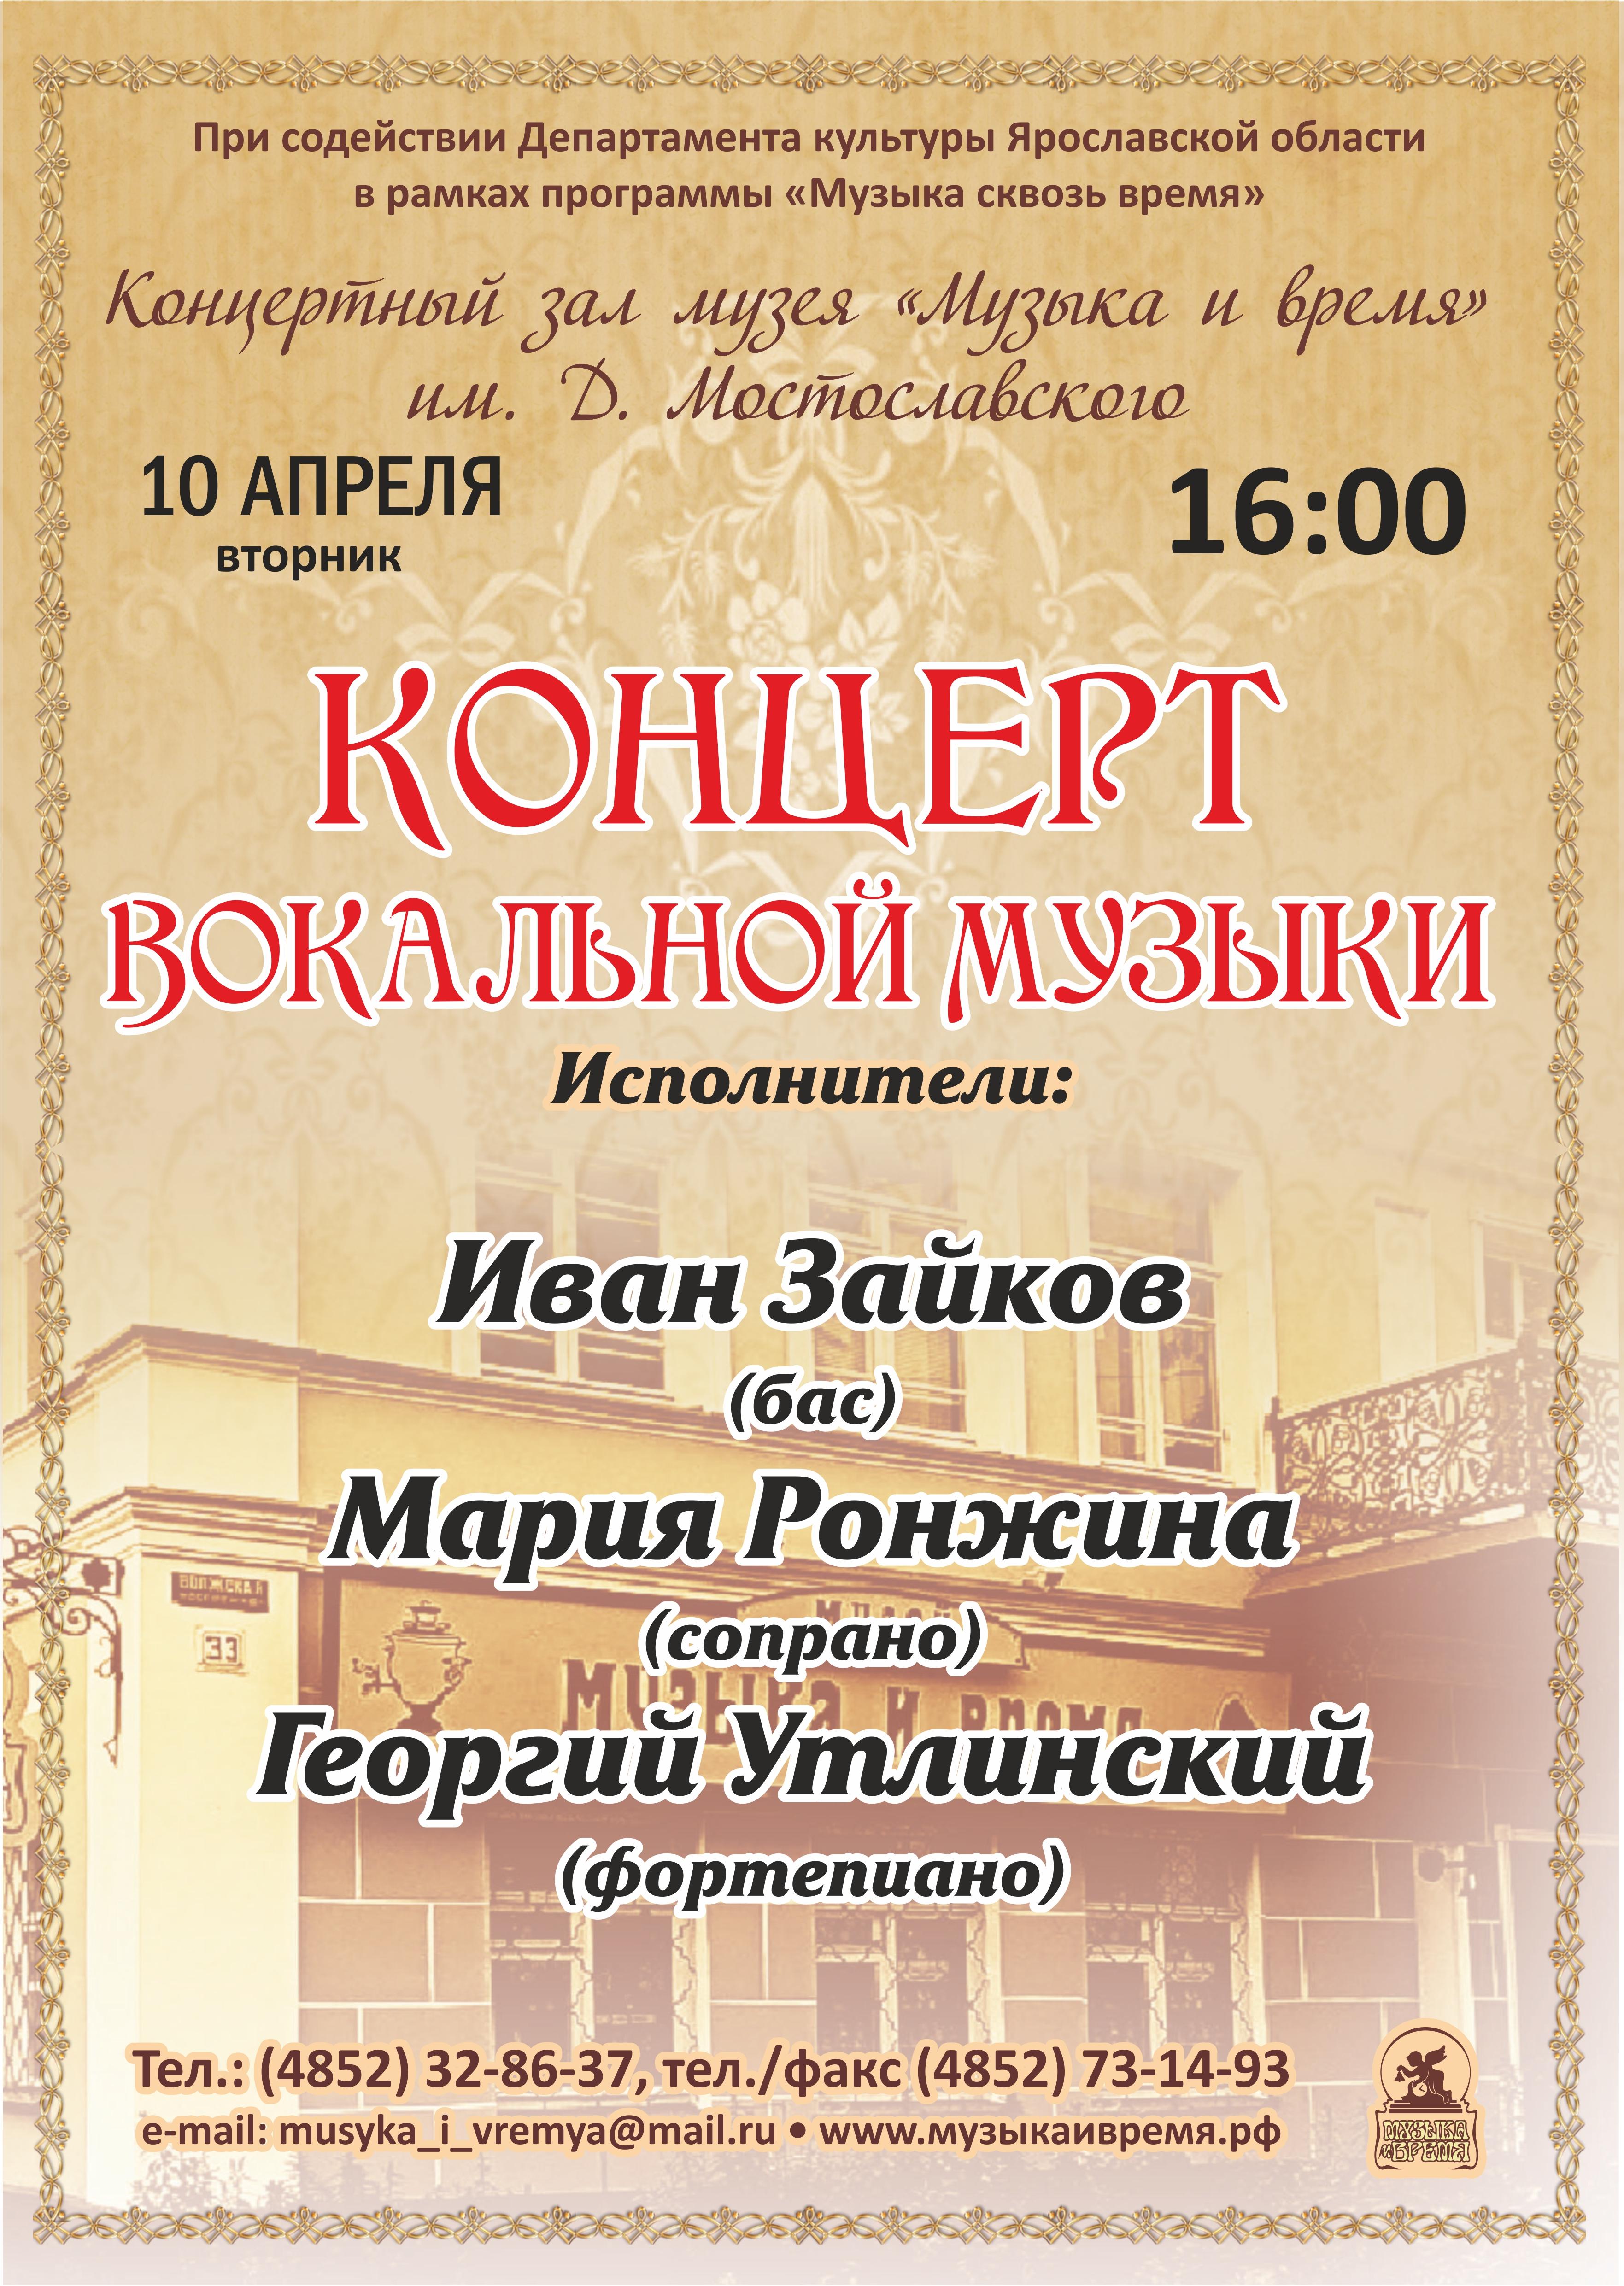 АФИША-апрель-10-1600